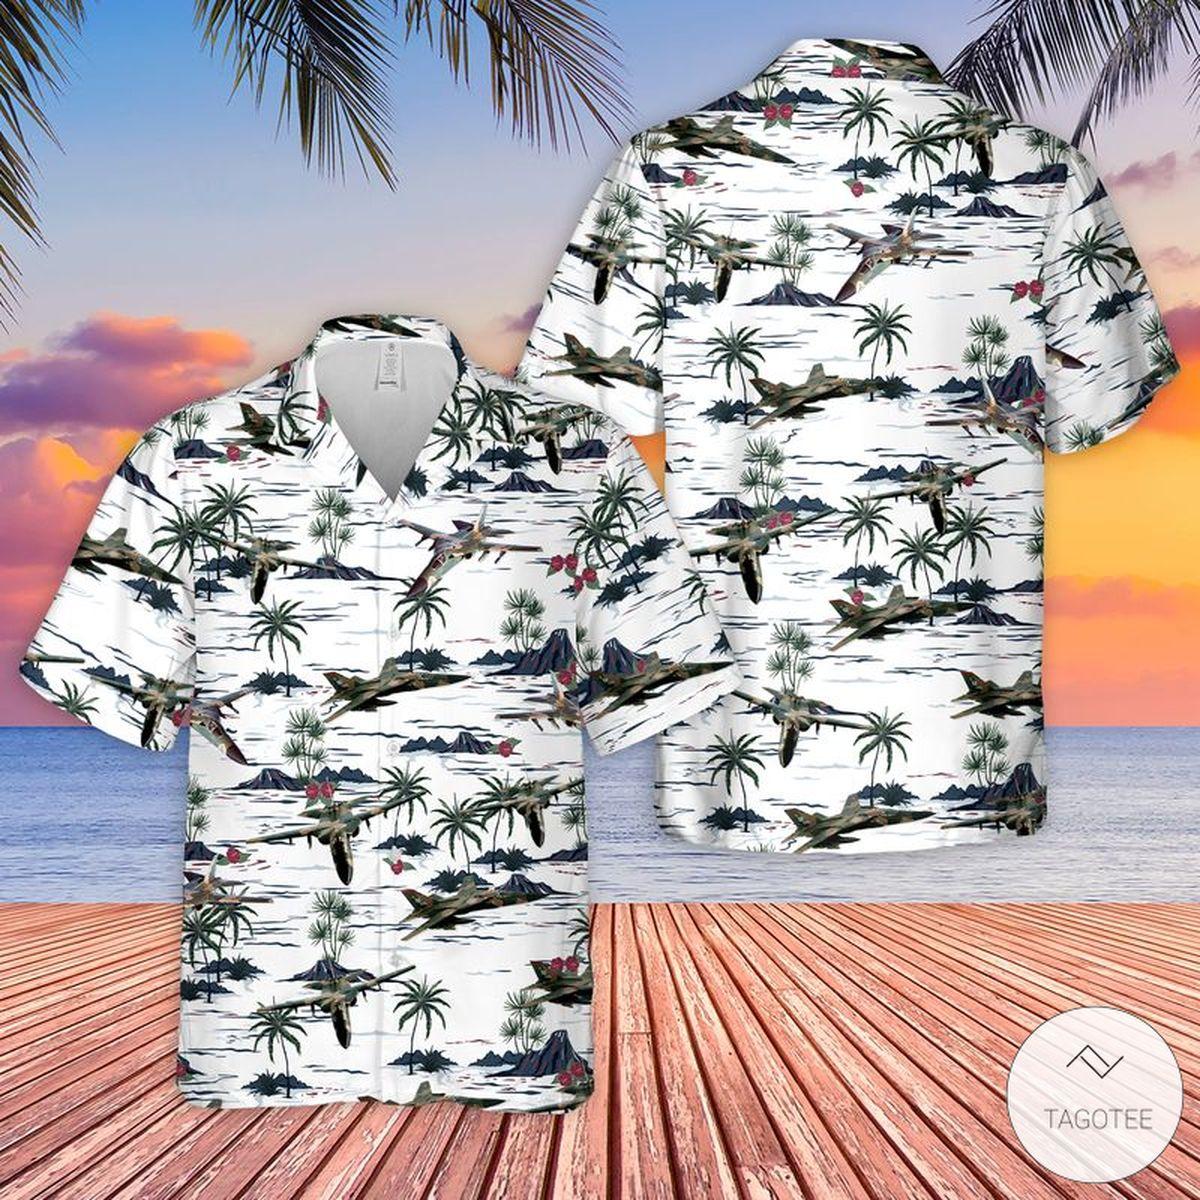 United States Air Force General Dynamics F-111 Aardvark Hawaiian Shirt, Beach Shorts